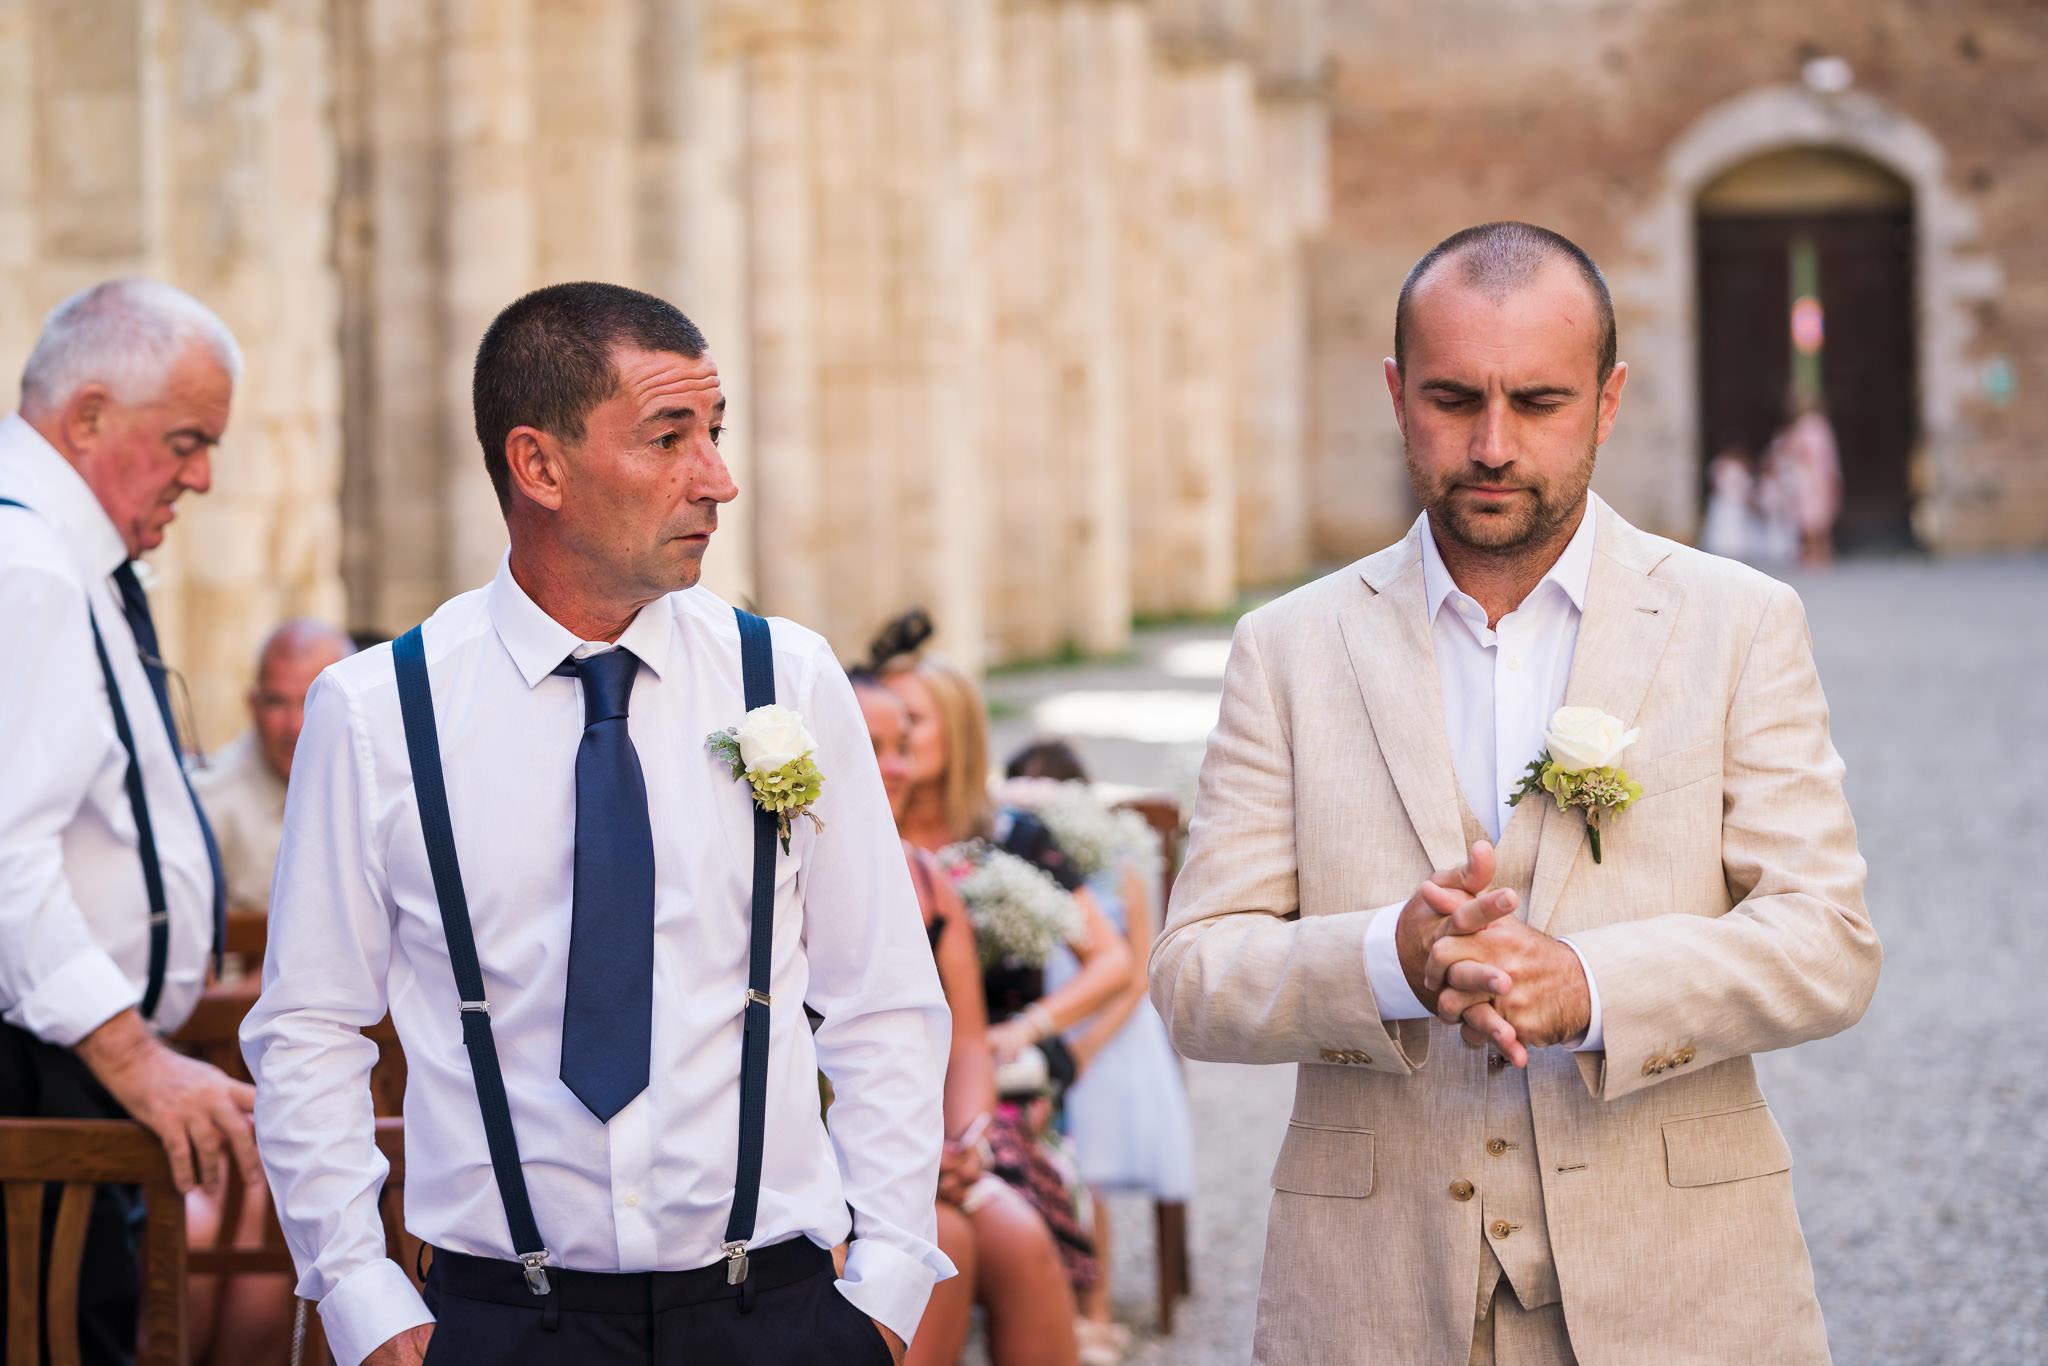 NC-2018-09-07_gemma-and-steve-wedding-1268.jpg